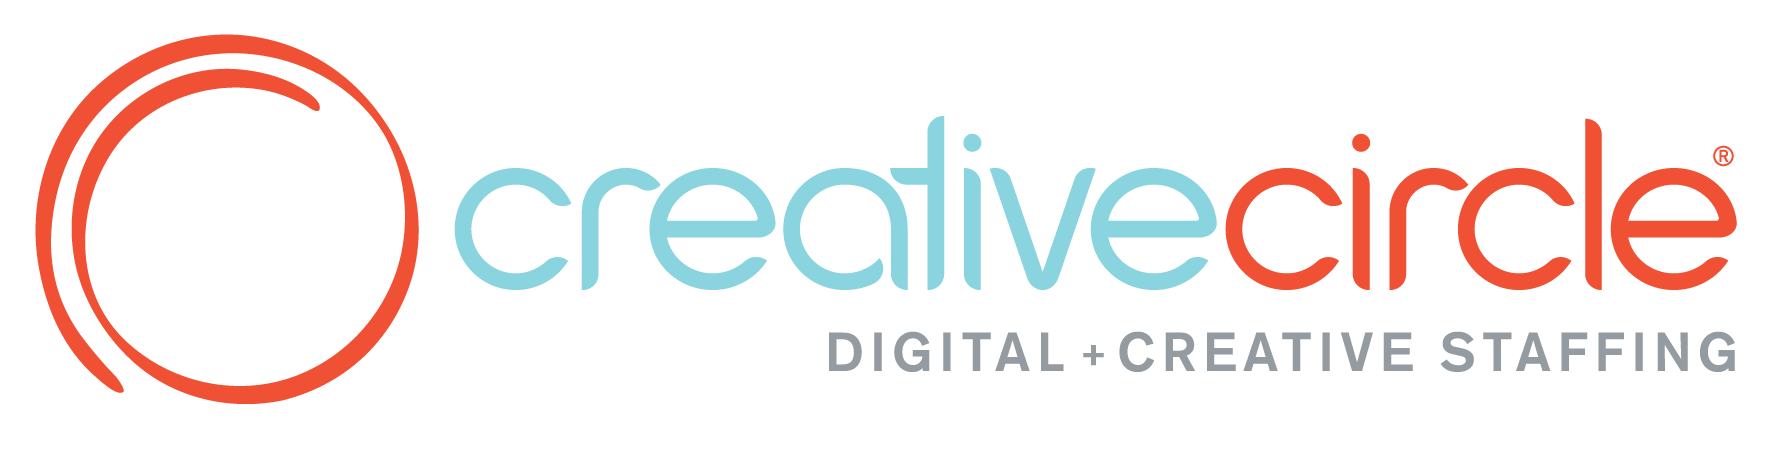 Adam Bleibtreu - Chief Marketing Officer, Creative Circle